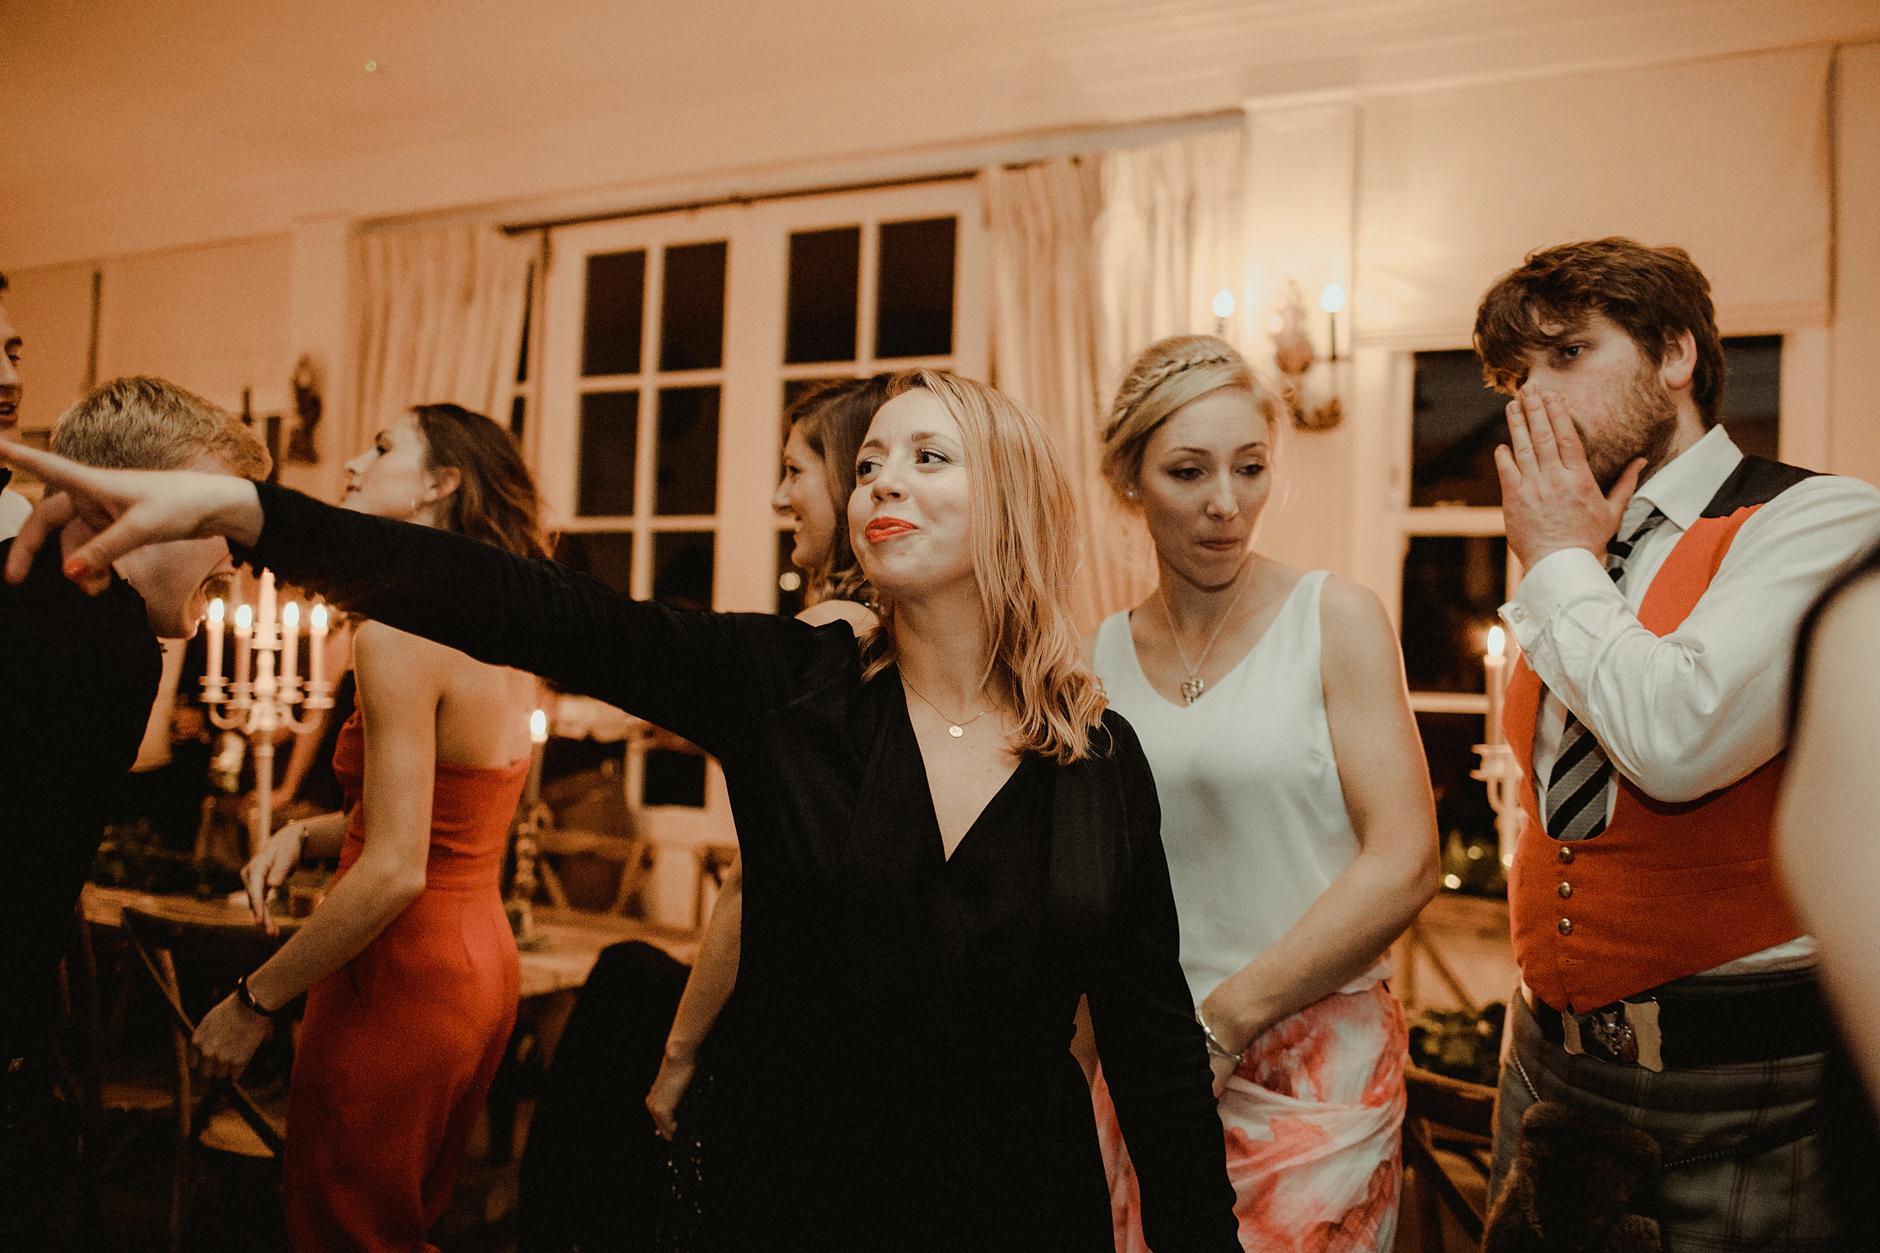 Glentruim-Wedding-Nikki-Leadbetter-Photography-392.jpg